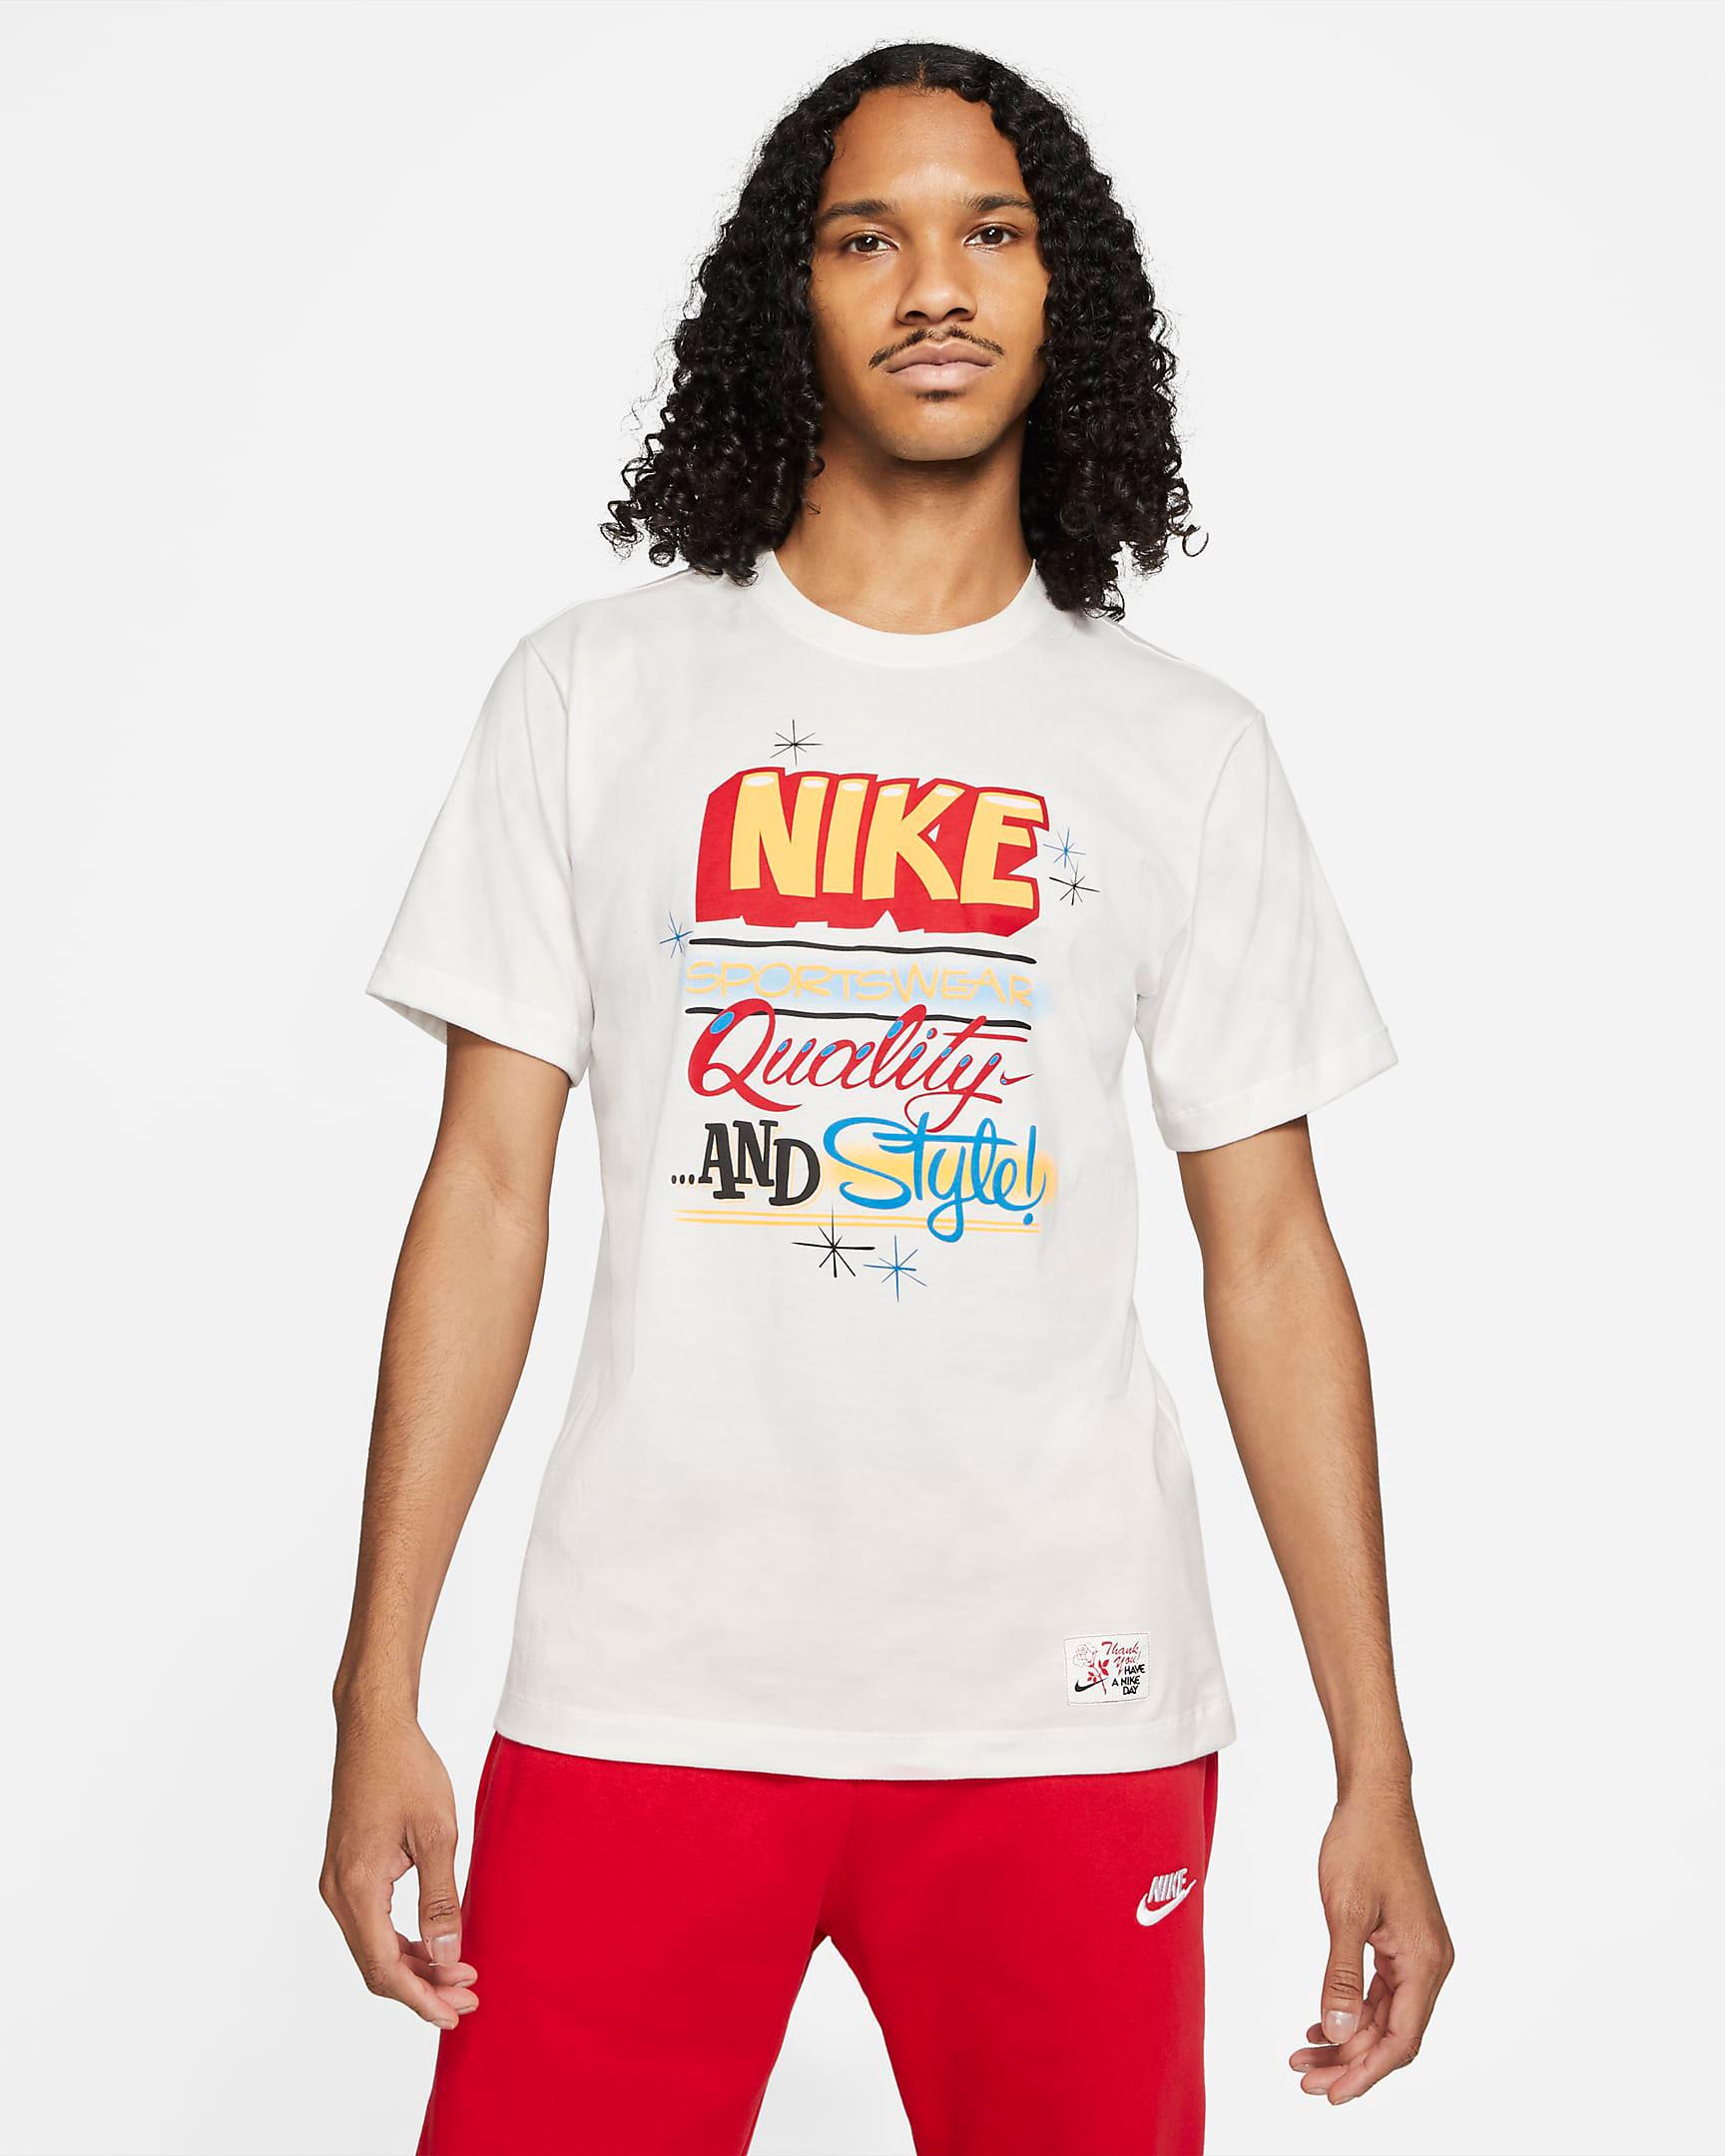 nike-dunk-low-city-market-shirt-1